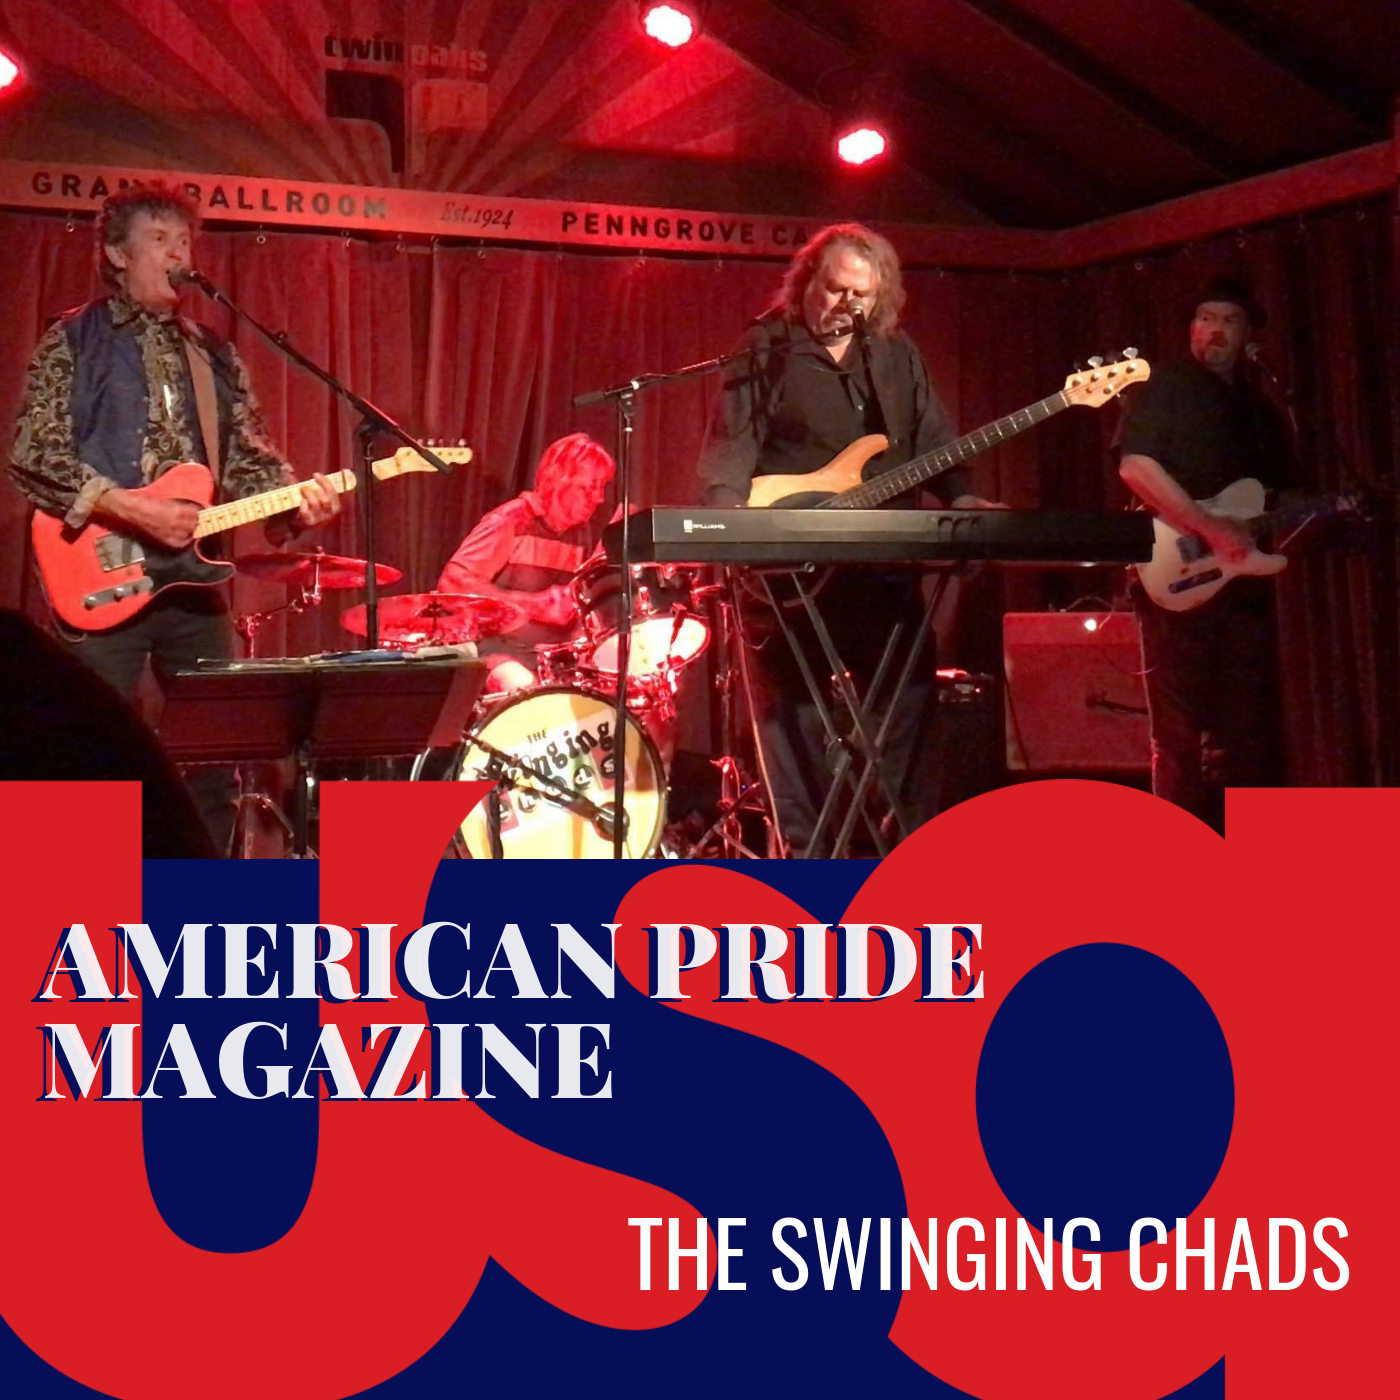 http://www.americanpridemagazine.com/latest/the-swinging-chads-bringing-the-heat-with-some-blue-sunshine